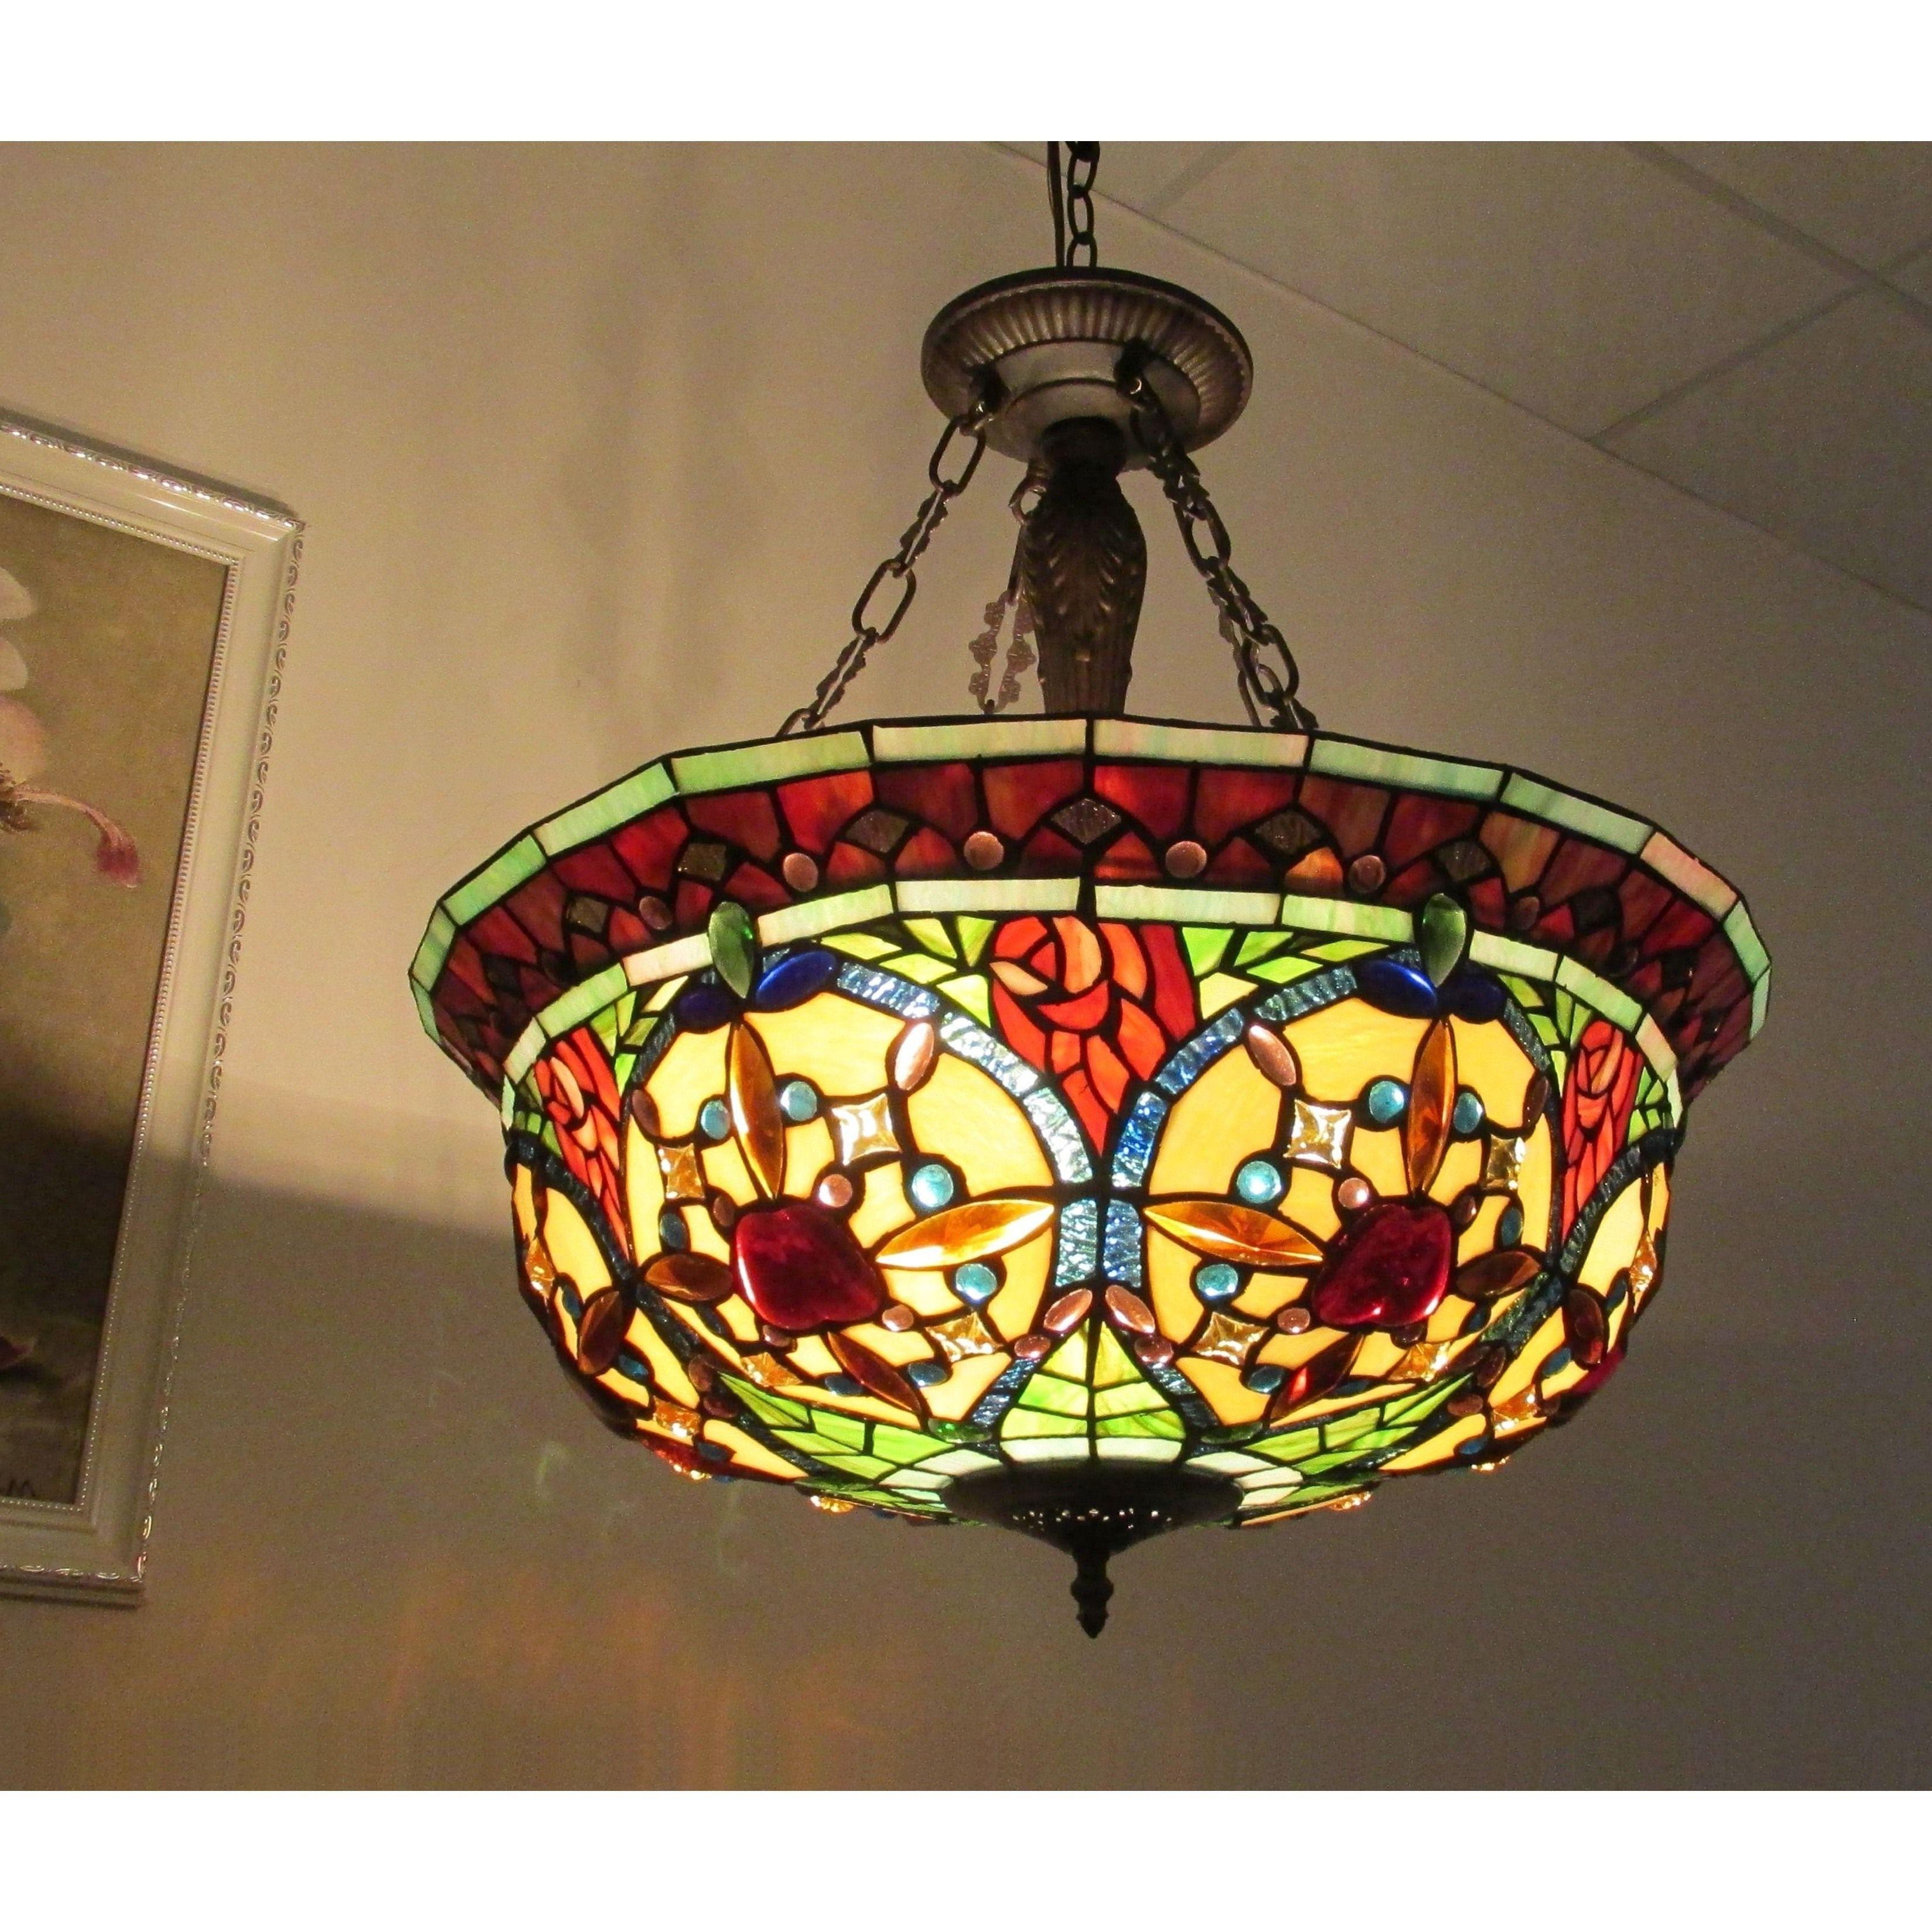 Modern Tiffany Kitchen Lighting Fresh On Small Room Gallery Island Lamp Pendant Light Dining Fixture